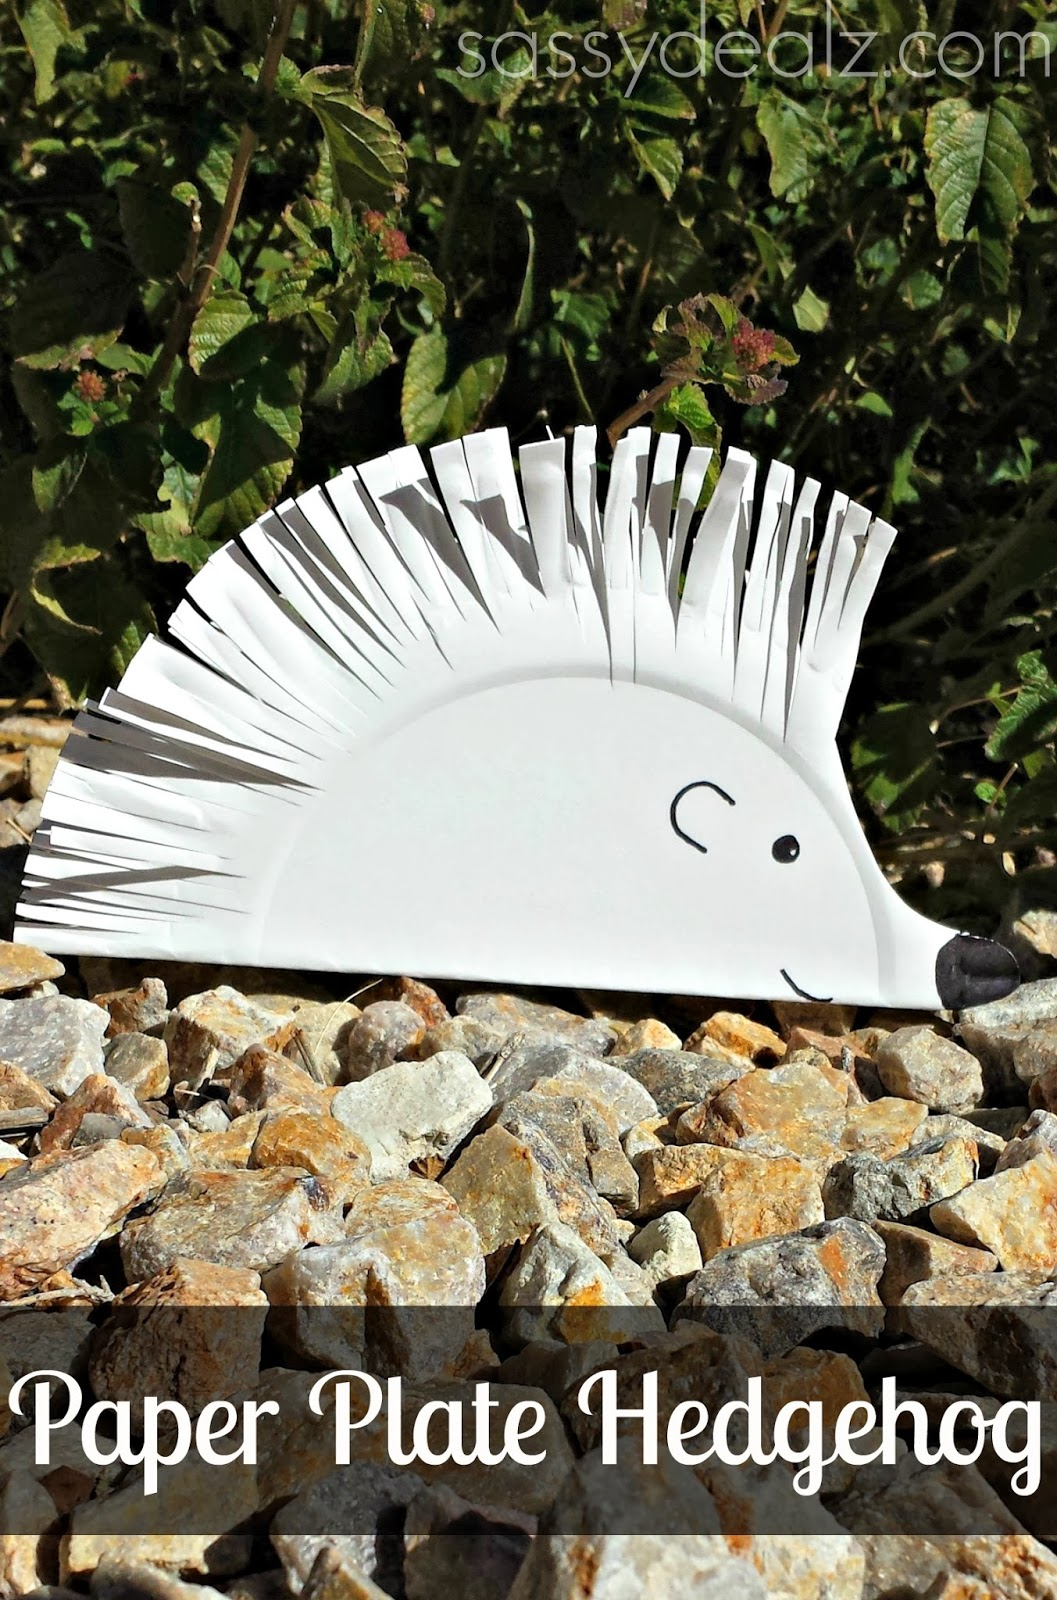 paper plate hedgehog craft - photo #7